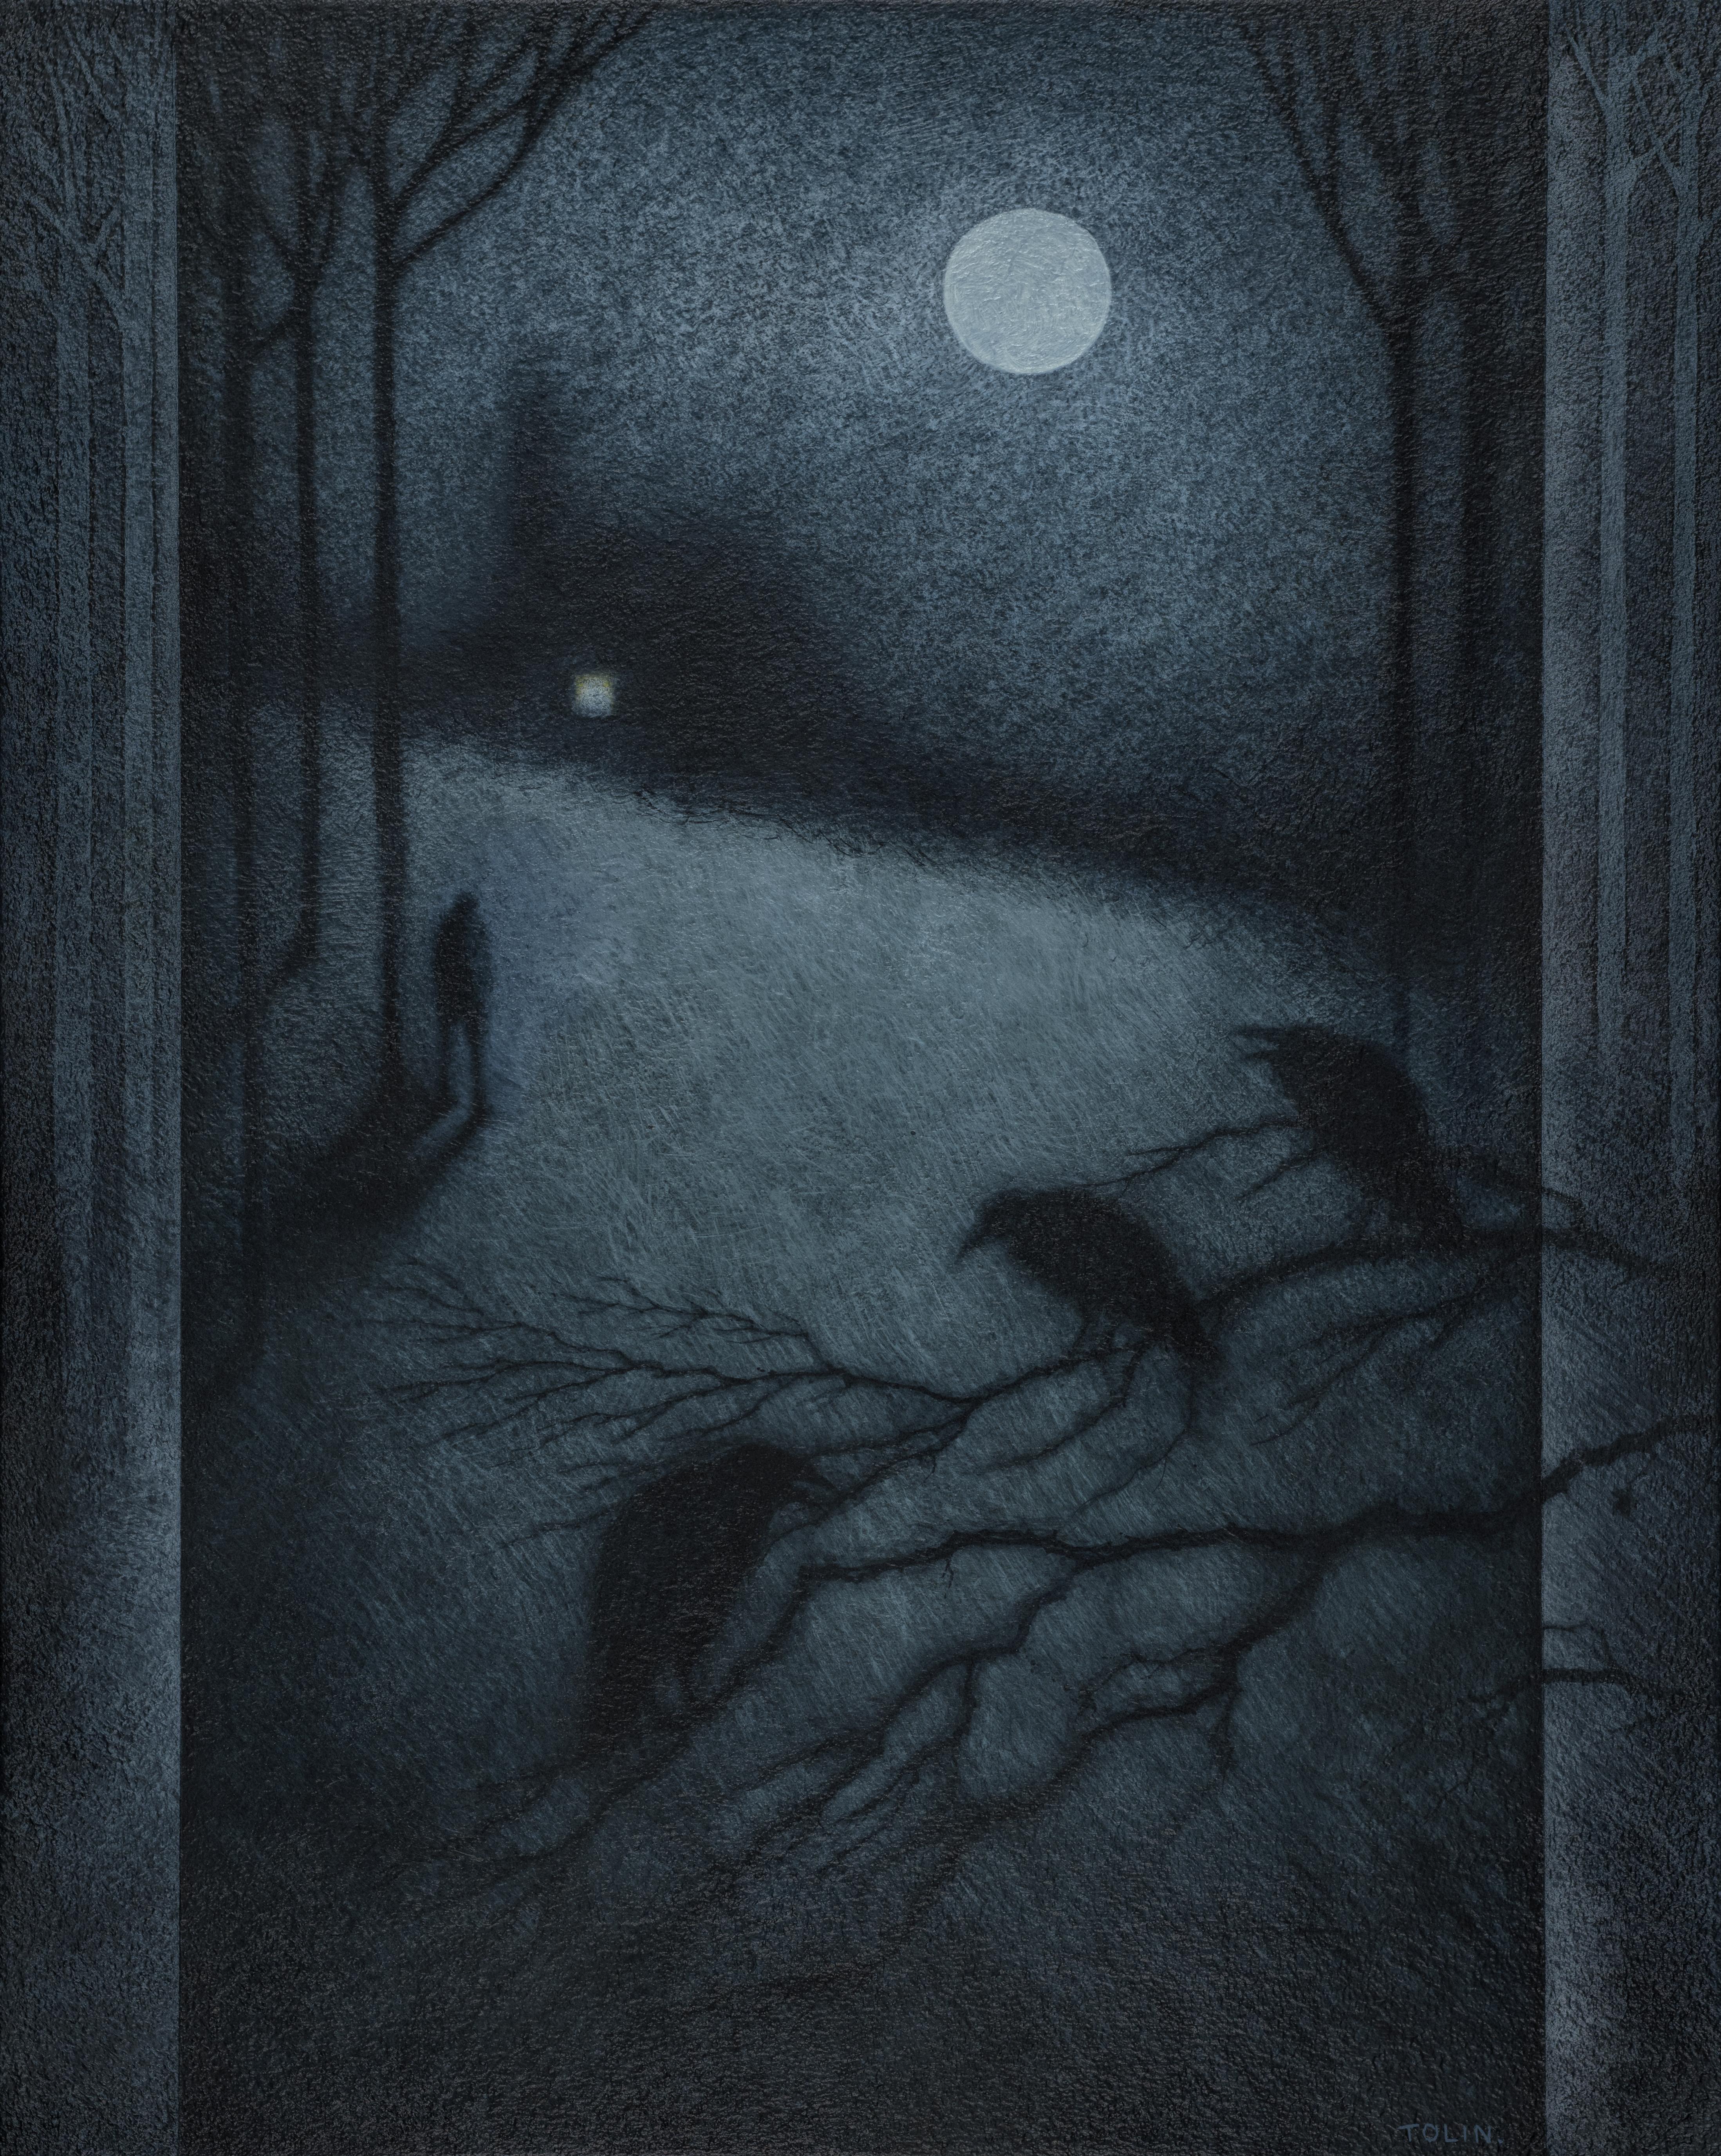 Oil on Panel - Nocturne